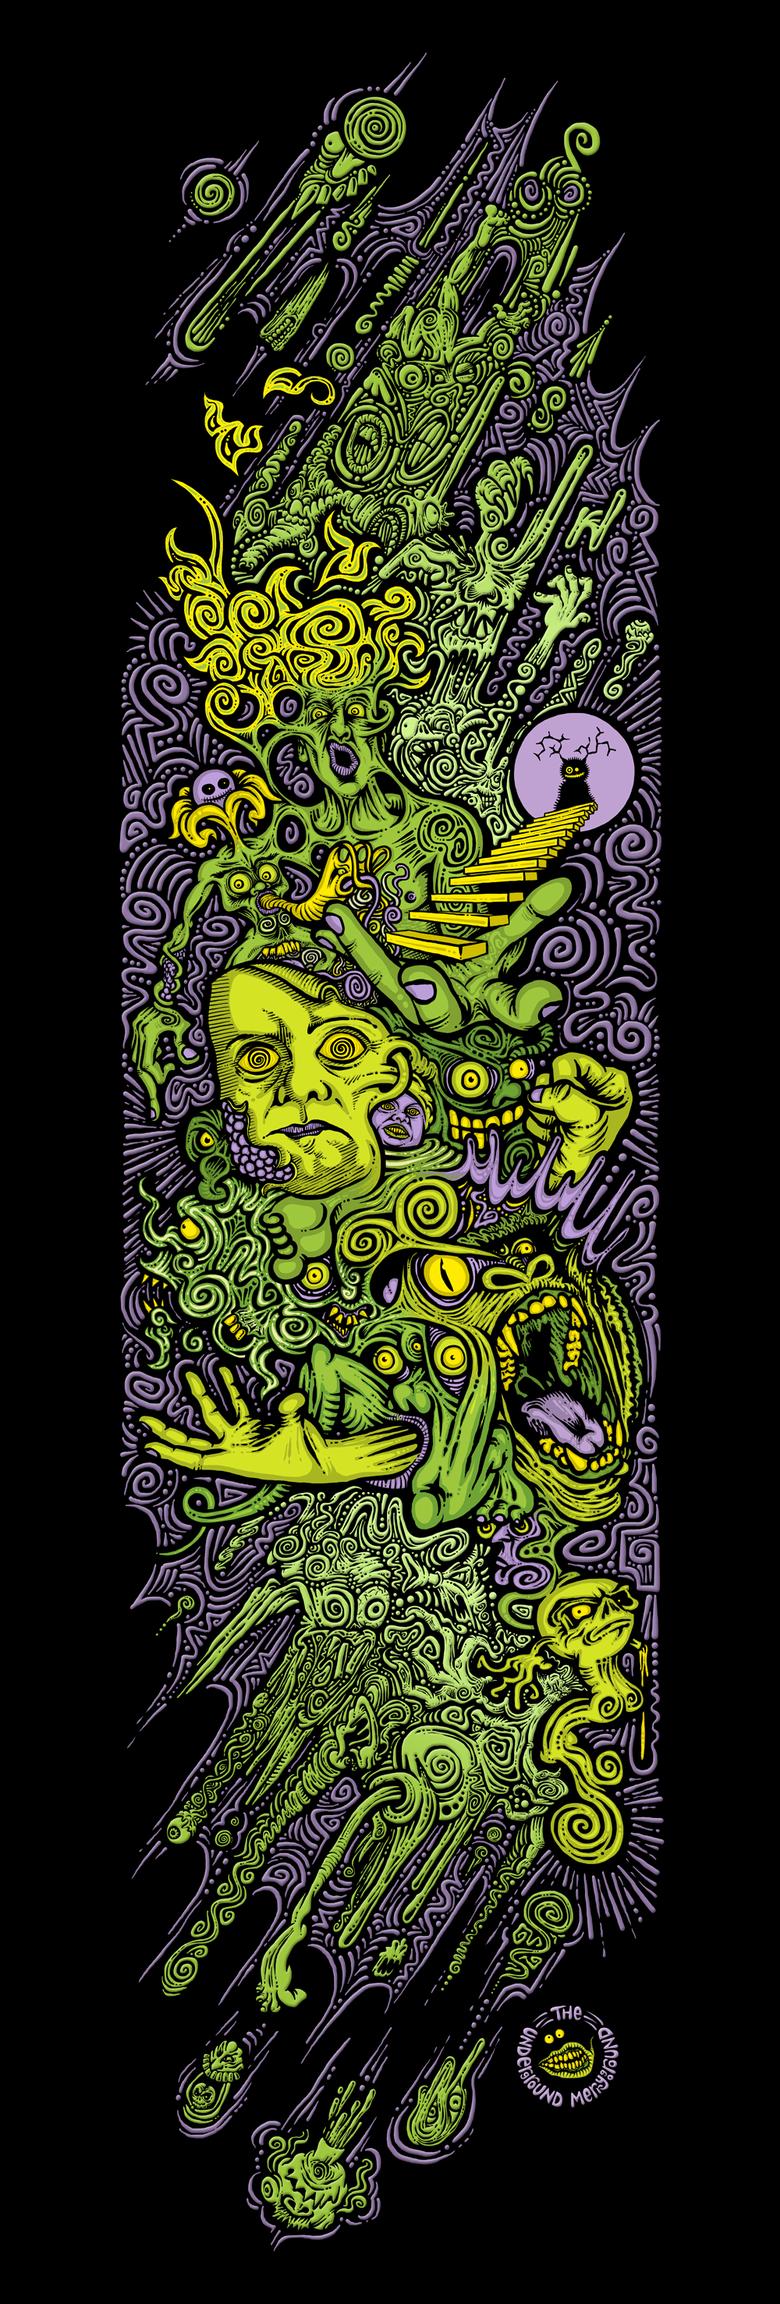 Image of Psychodelirium